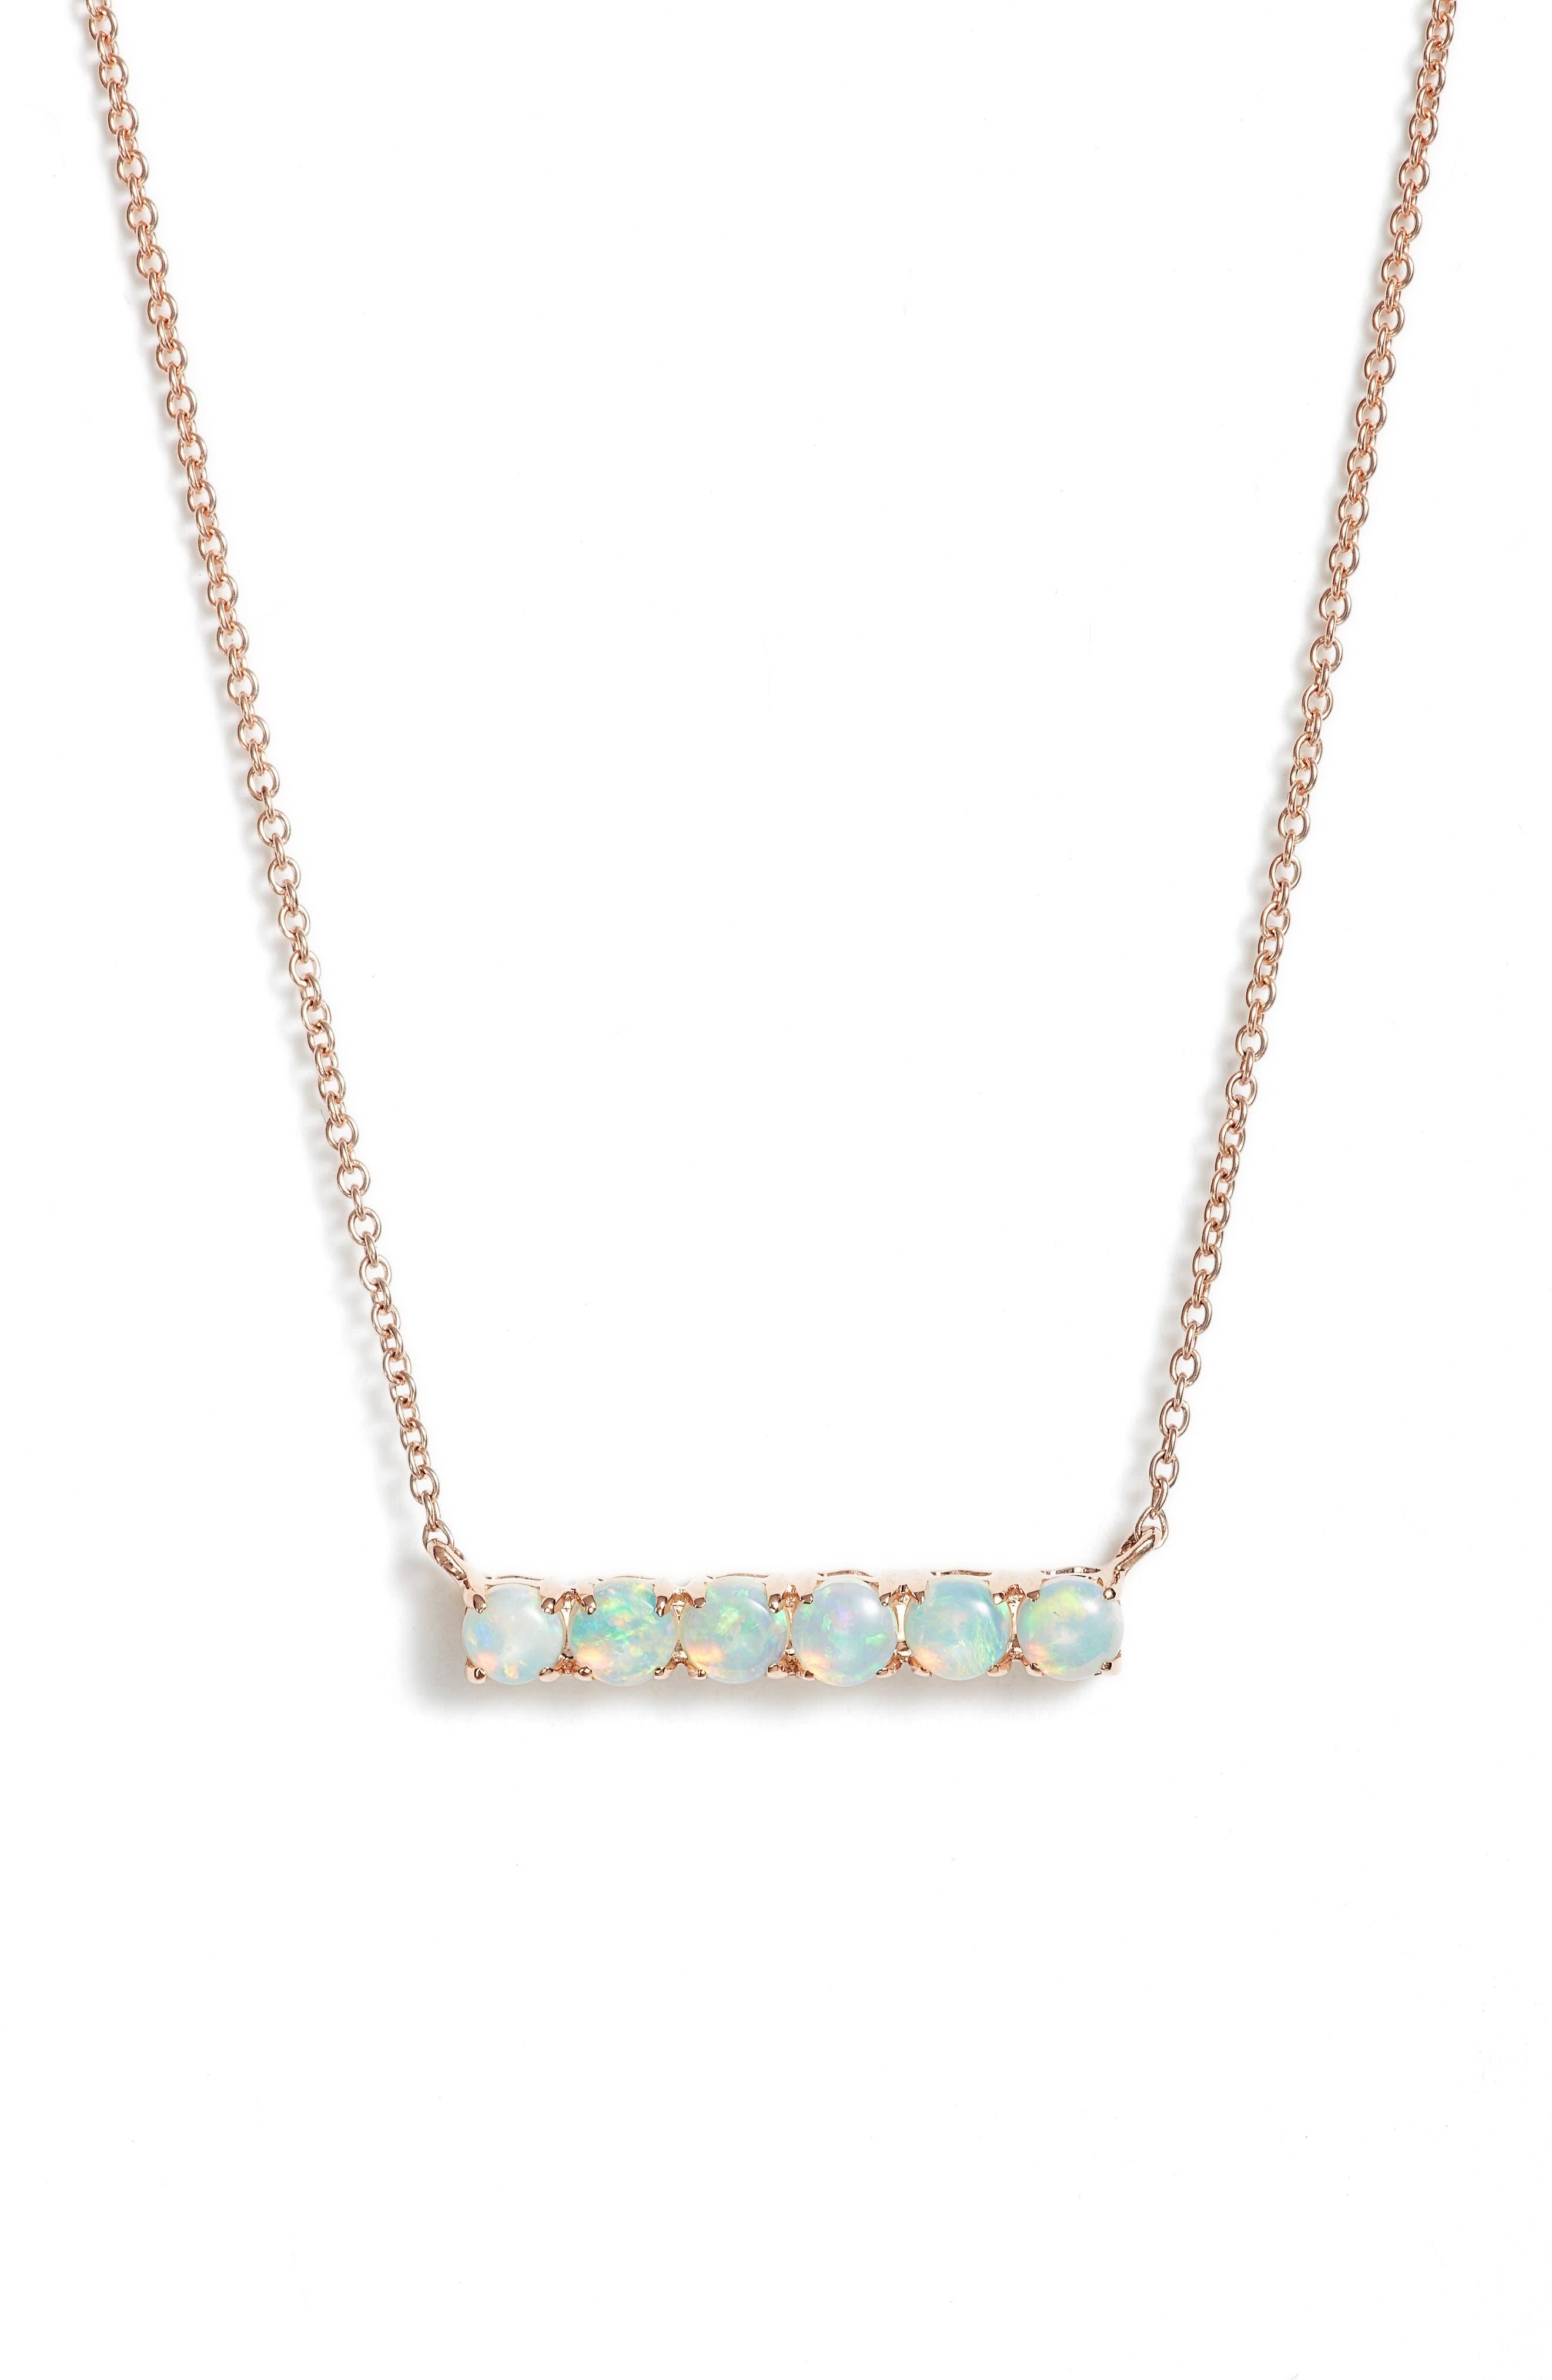 Main Image - Dana Rebecca Designs Bar Pendant Necklace